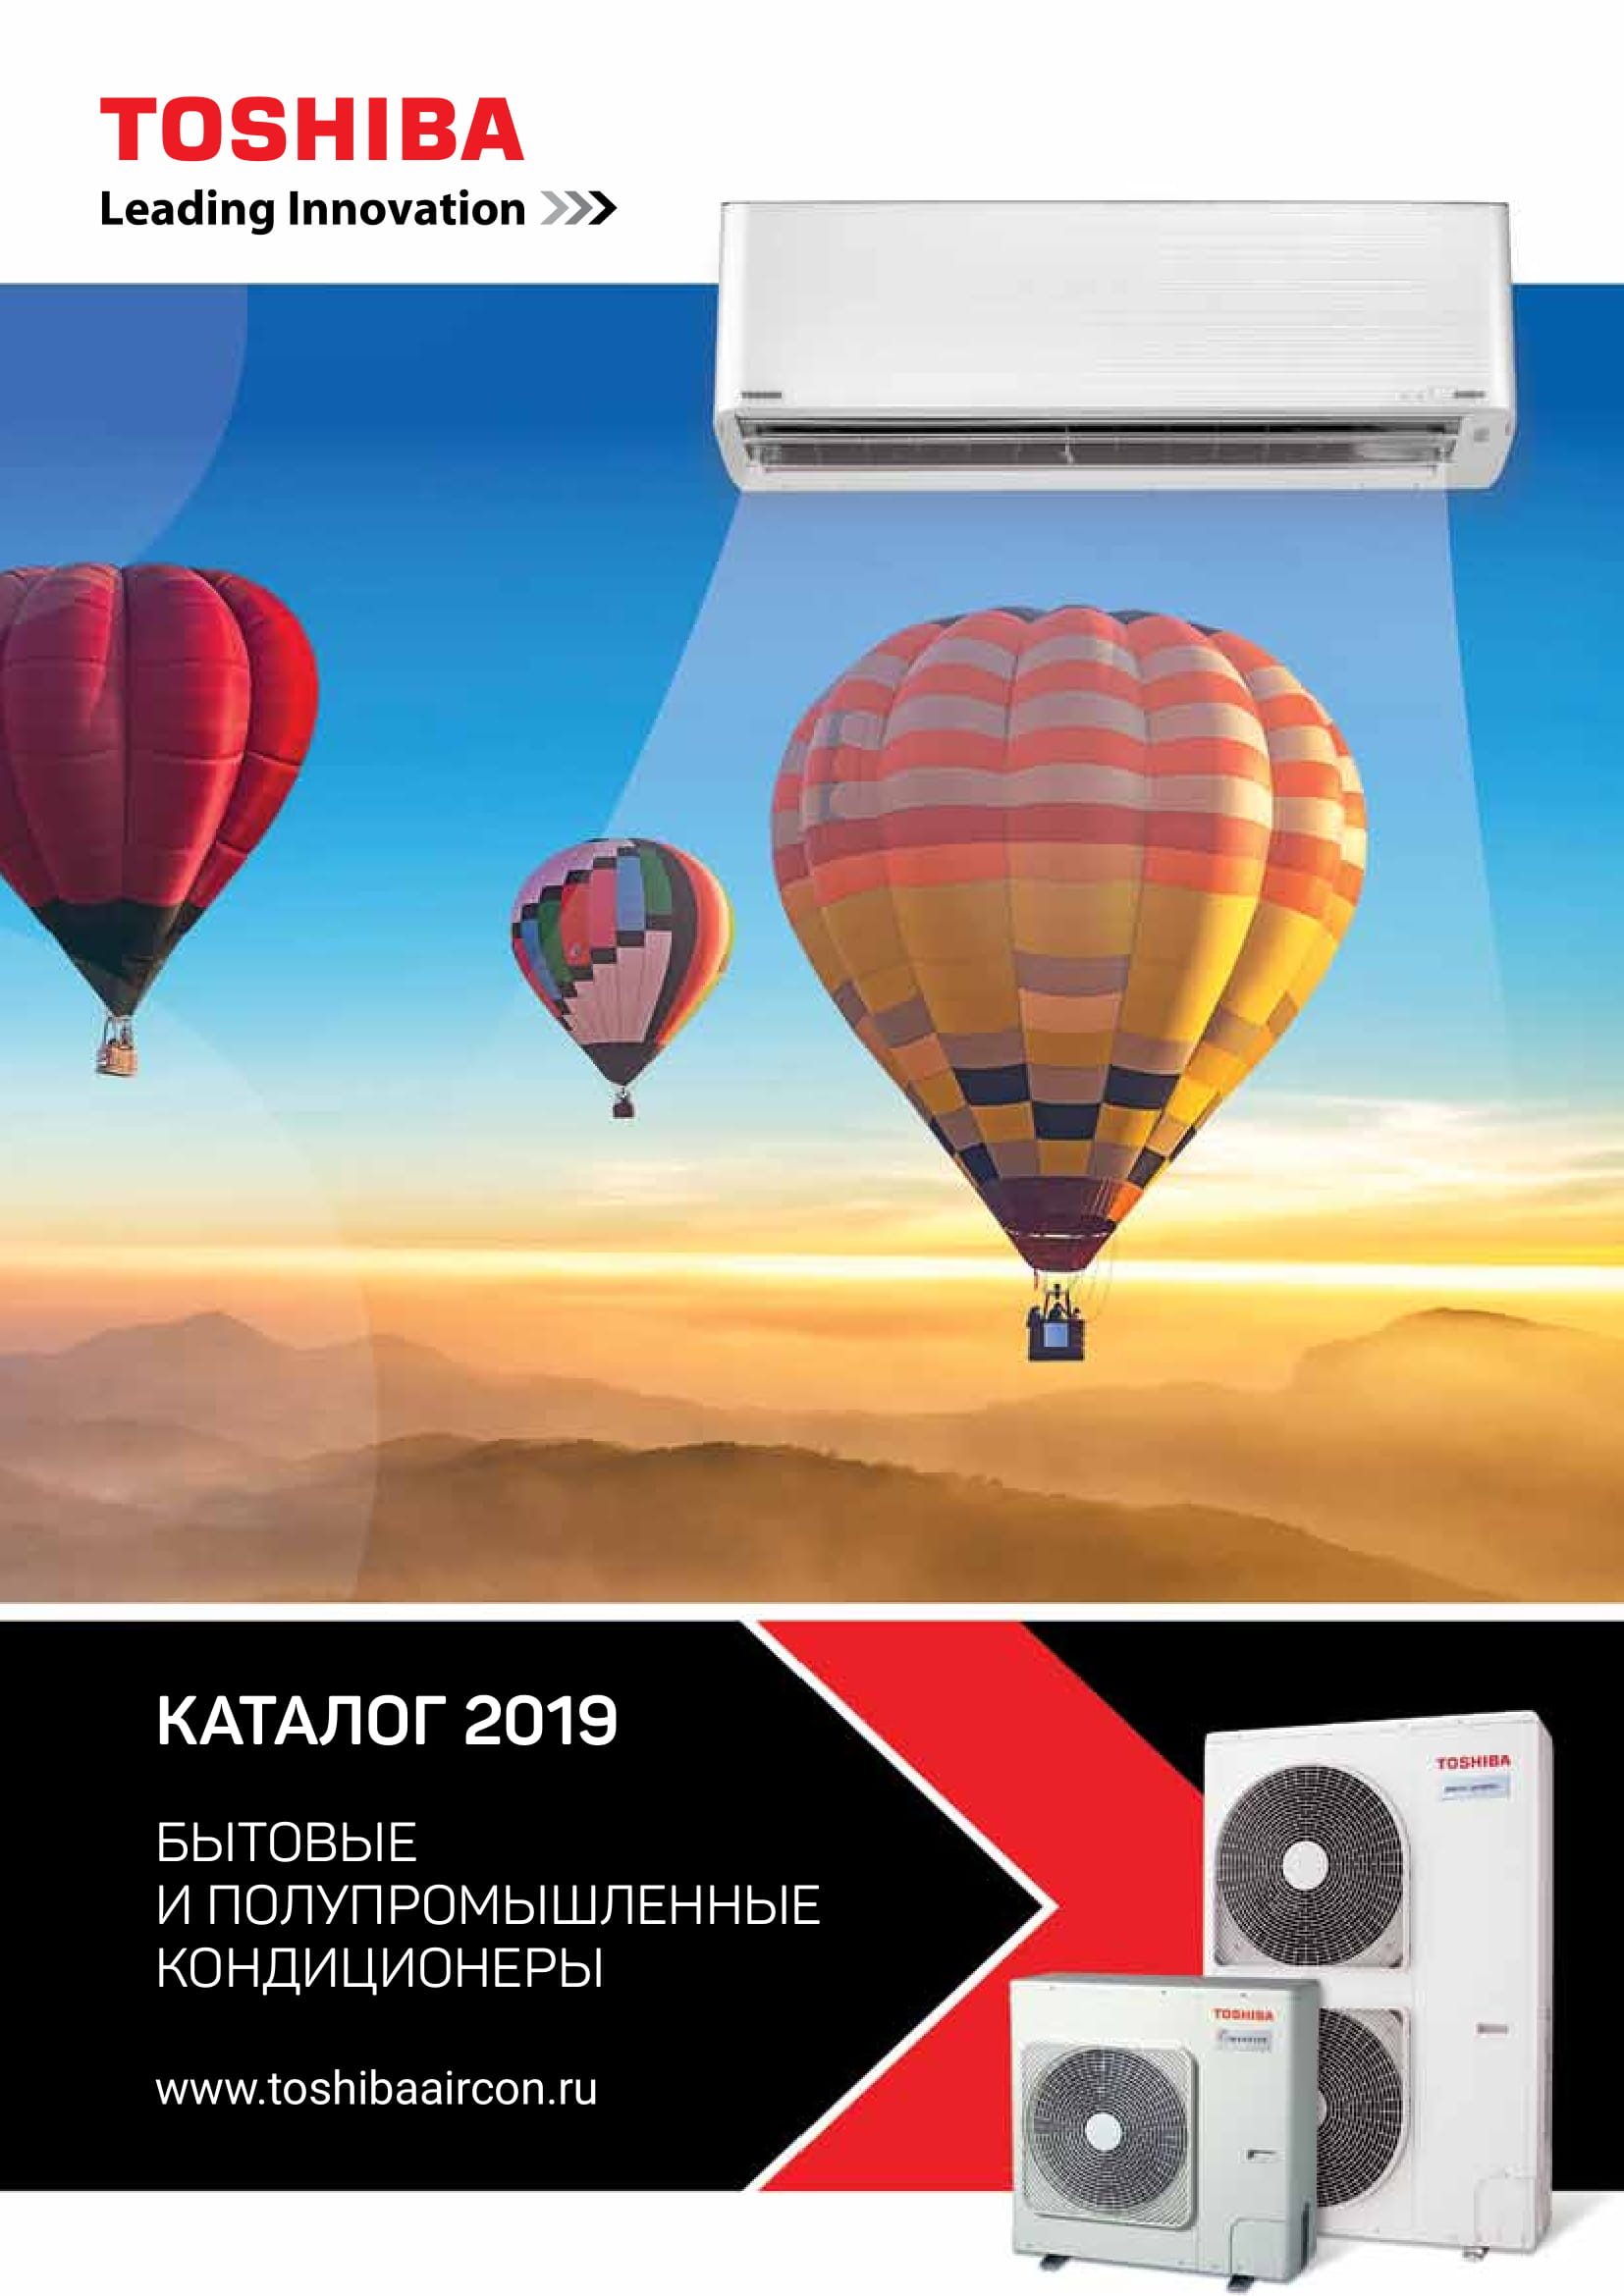 каталог Toshiba 2019